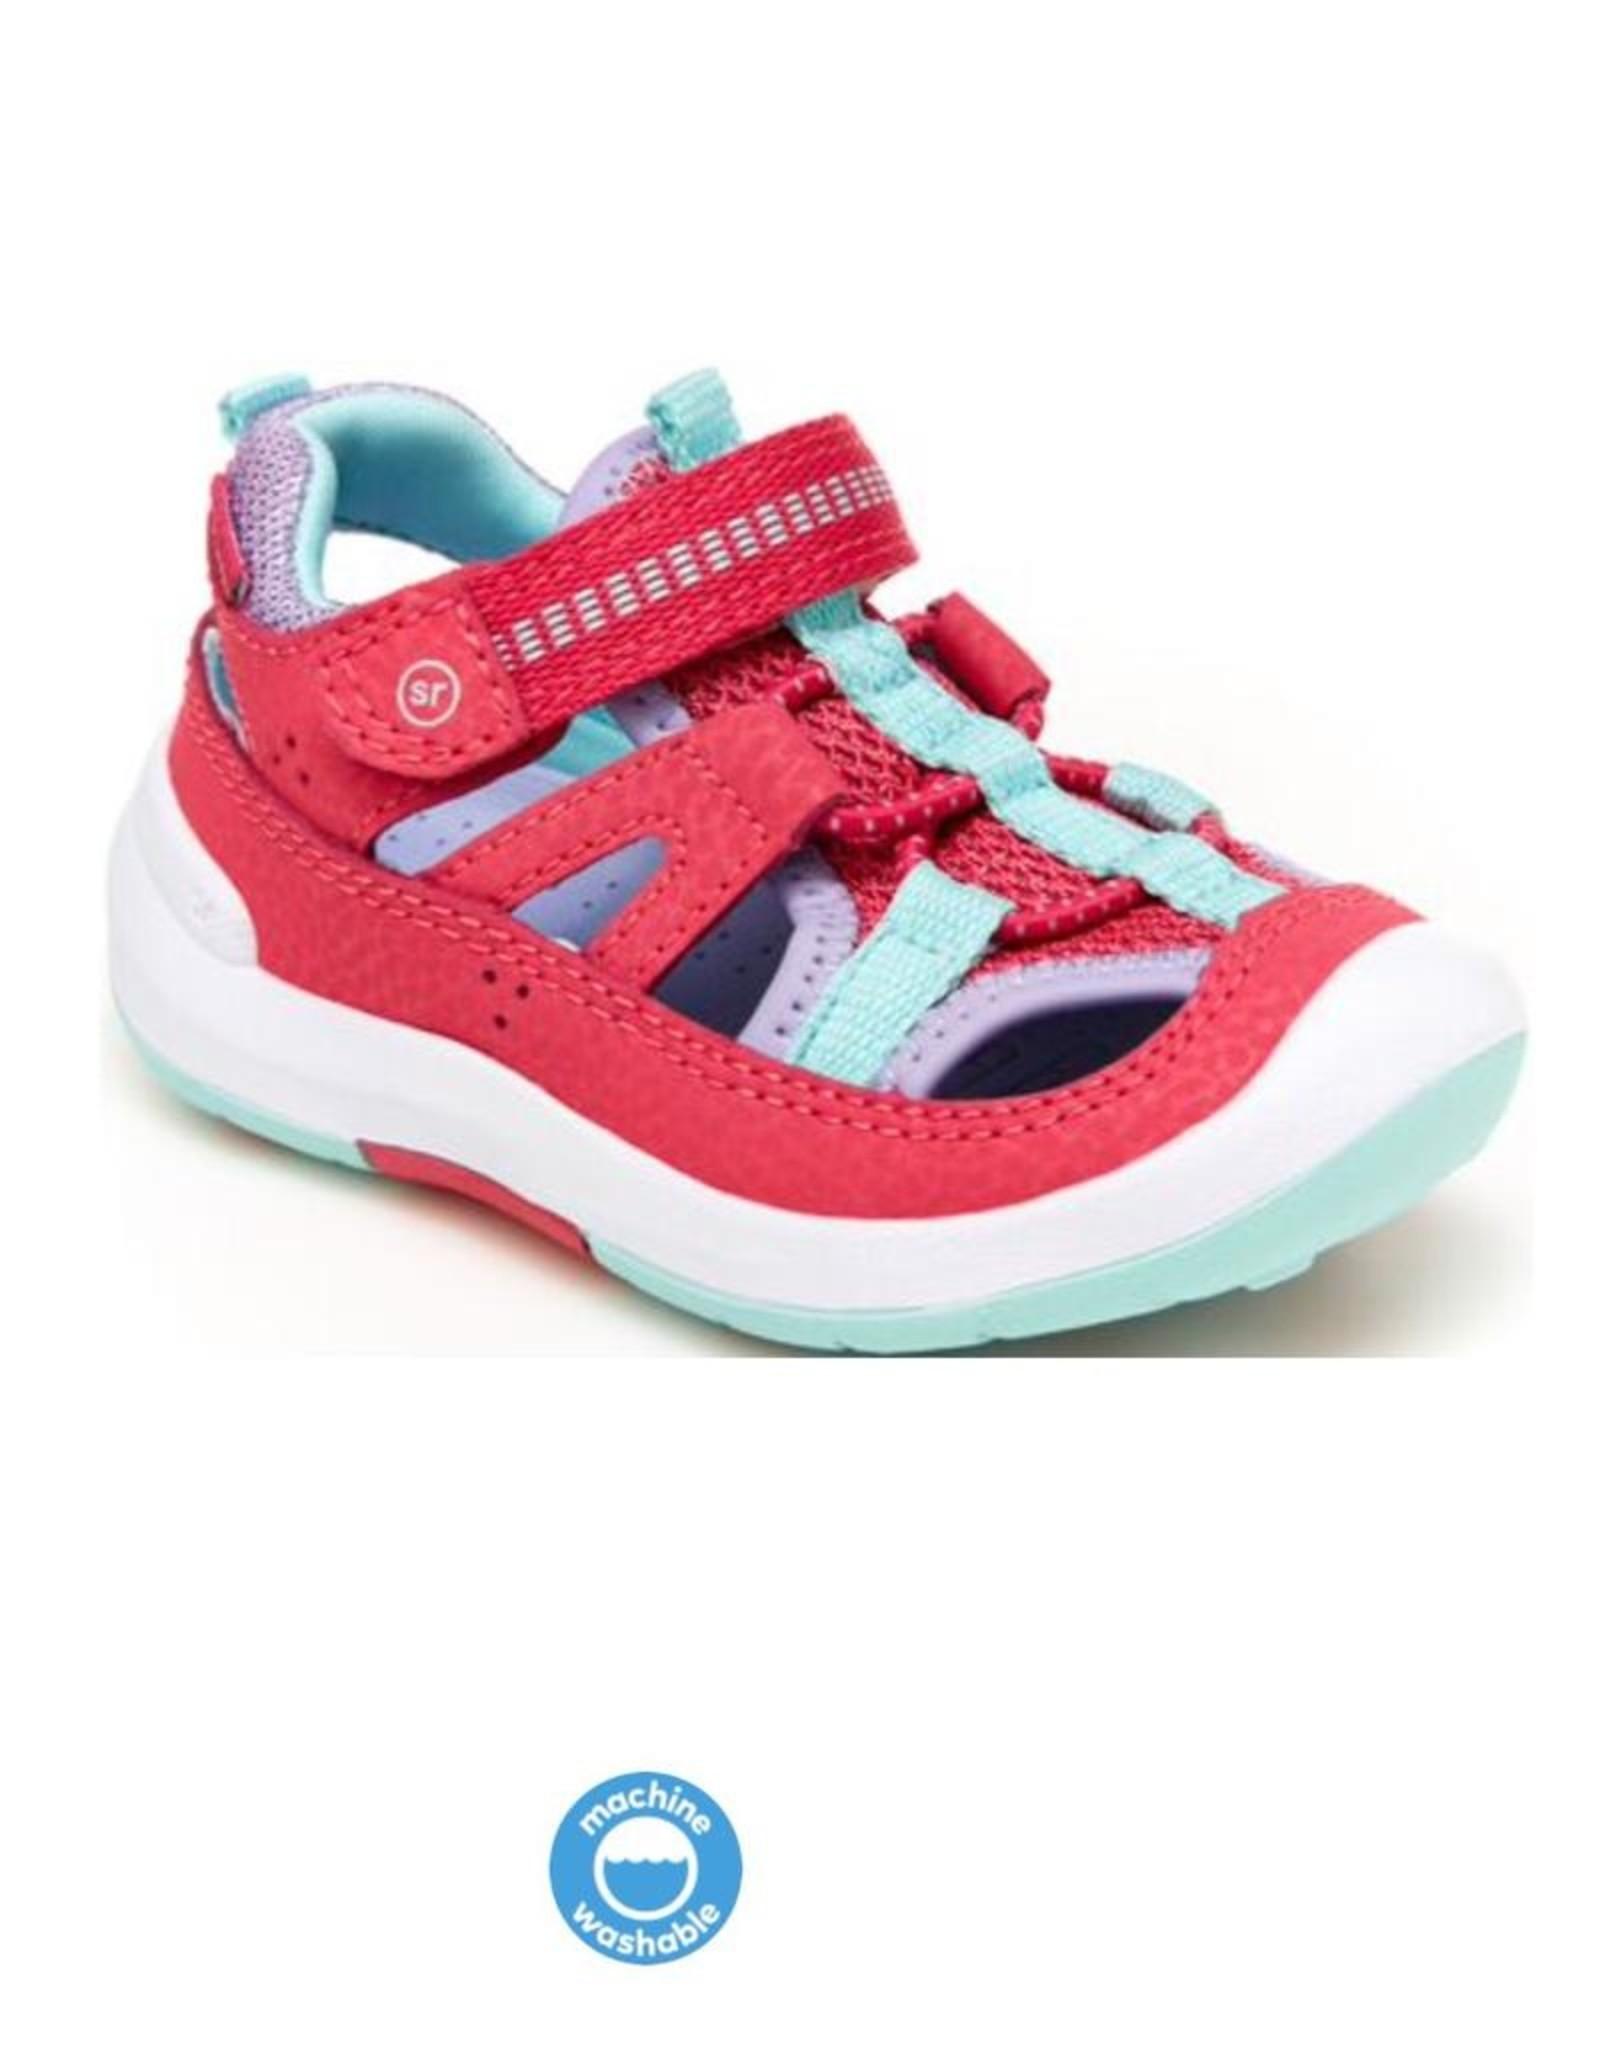 Striderite Pink SRTech Wade Sneaker Sandal